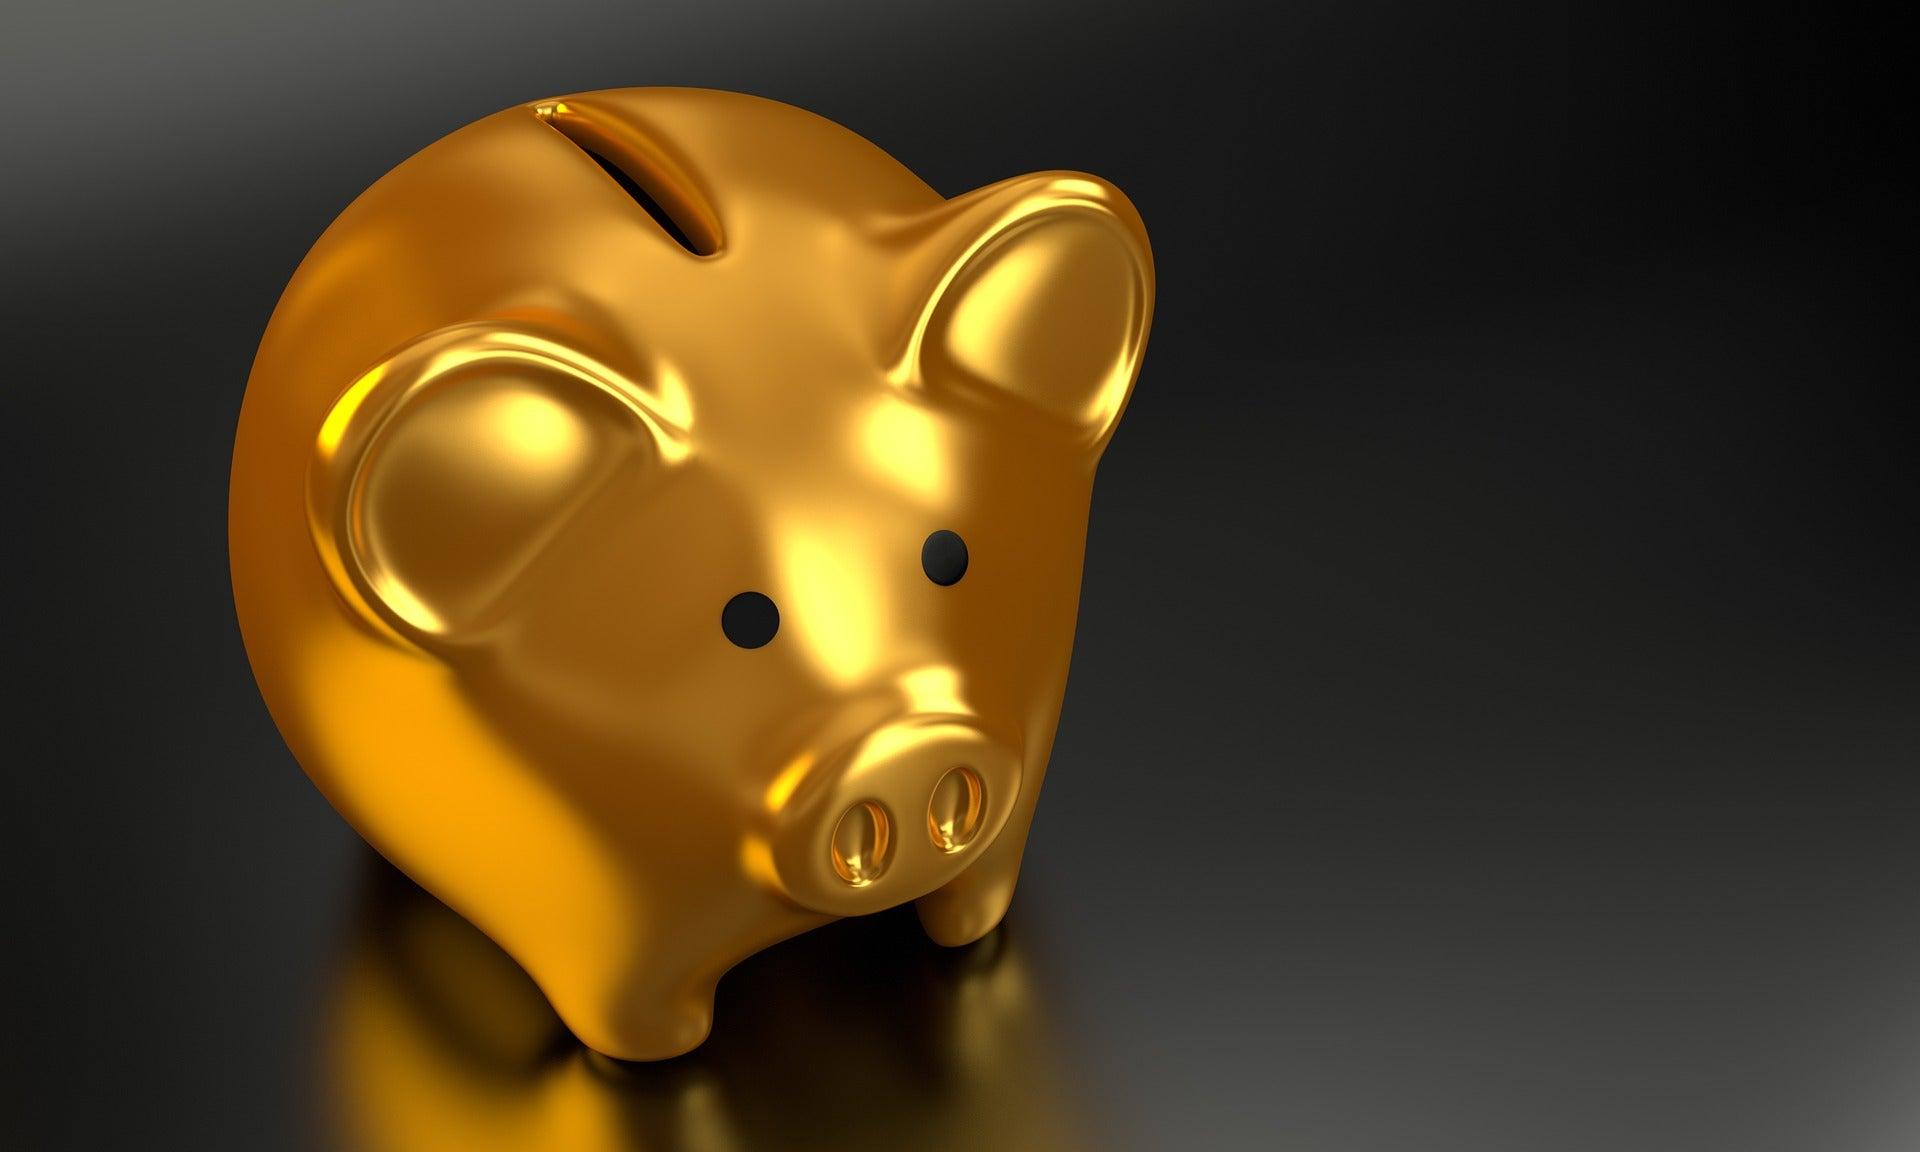 Morgan Stanley's Takeaways From LendingClub's Loan Numbers (NYSE:LC